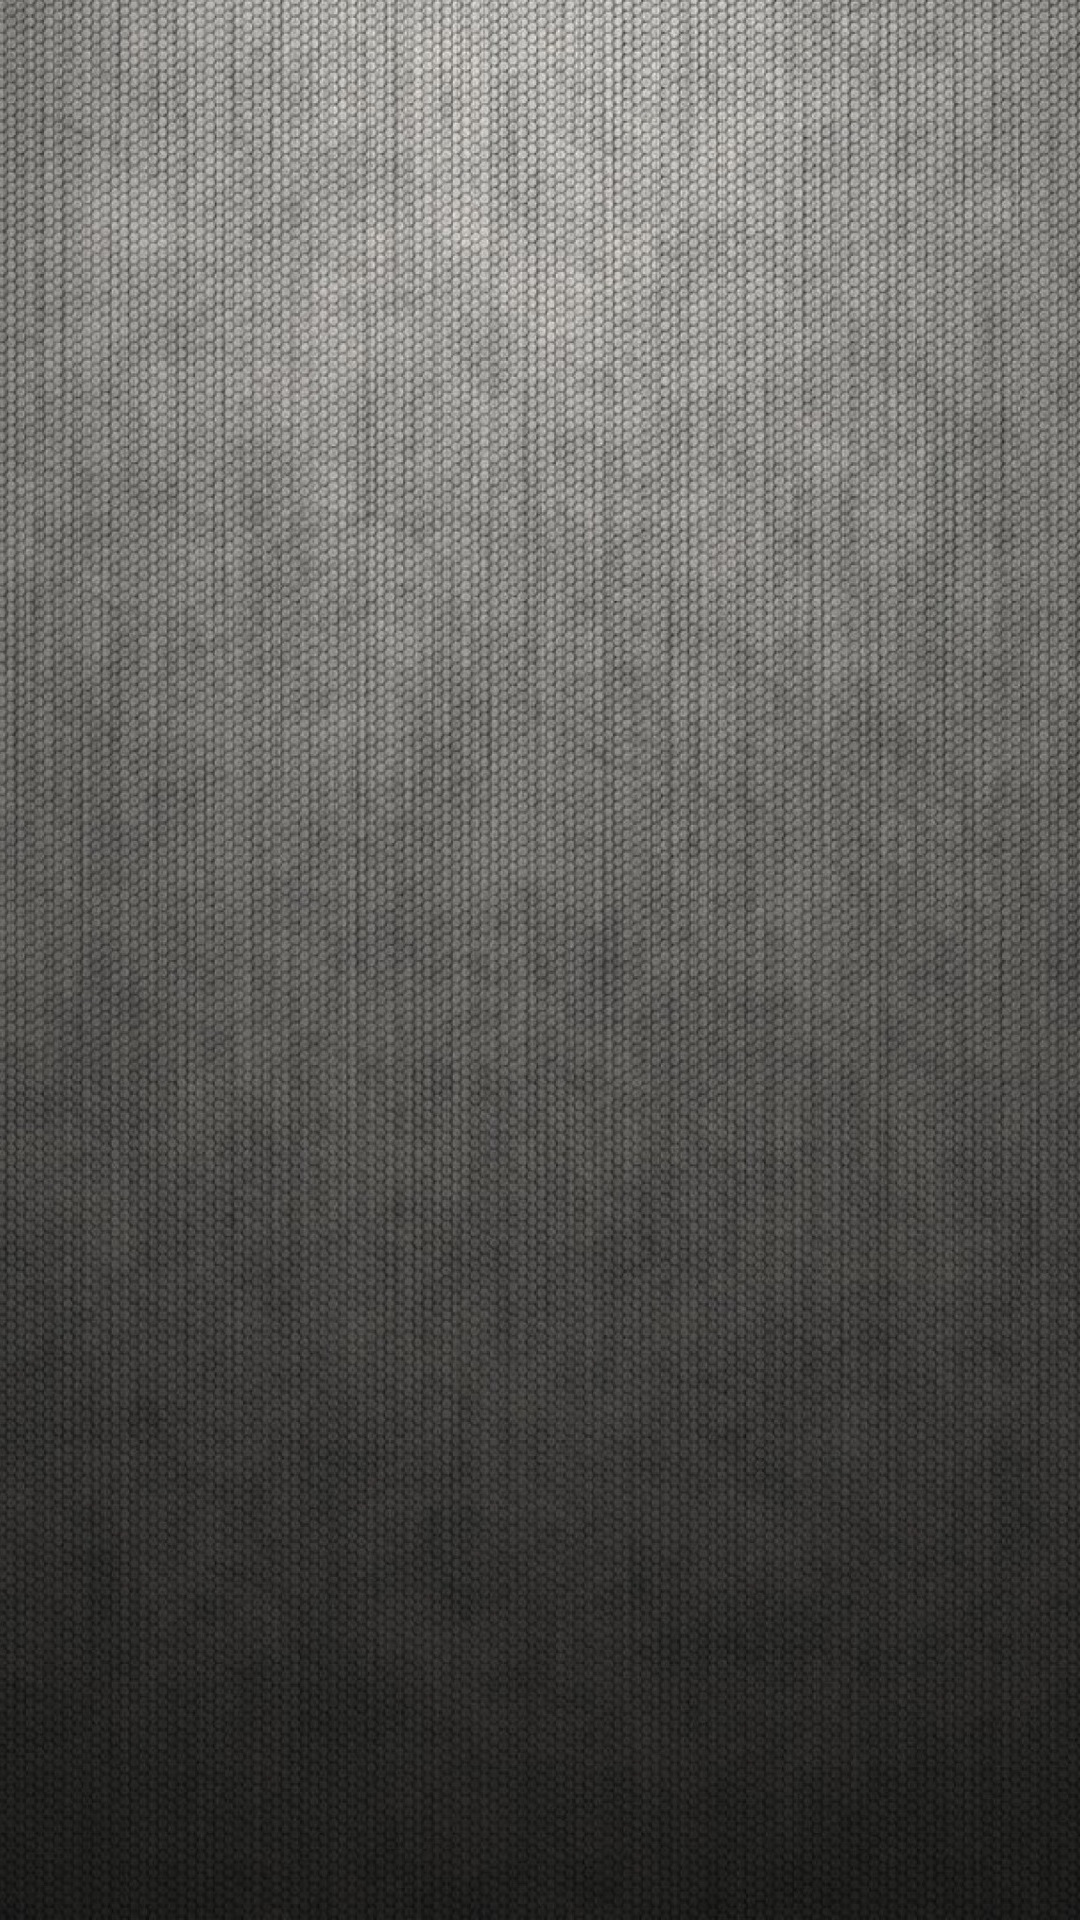 LINE Background Wallpaper 03216のLINE背景画像壁紙